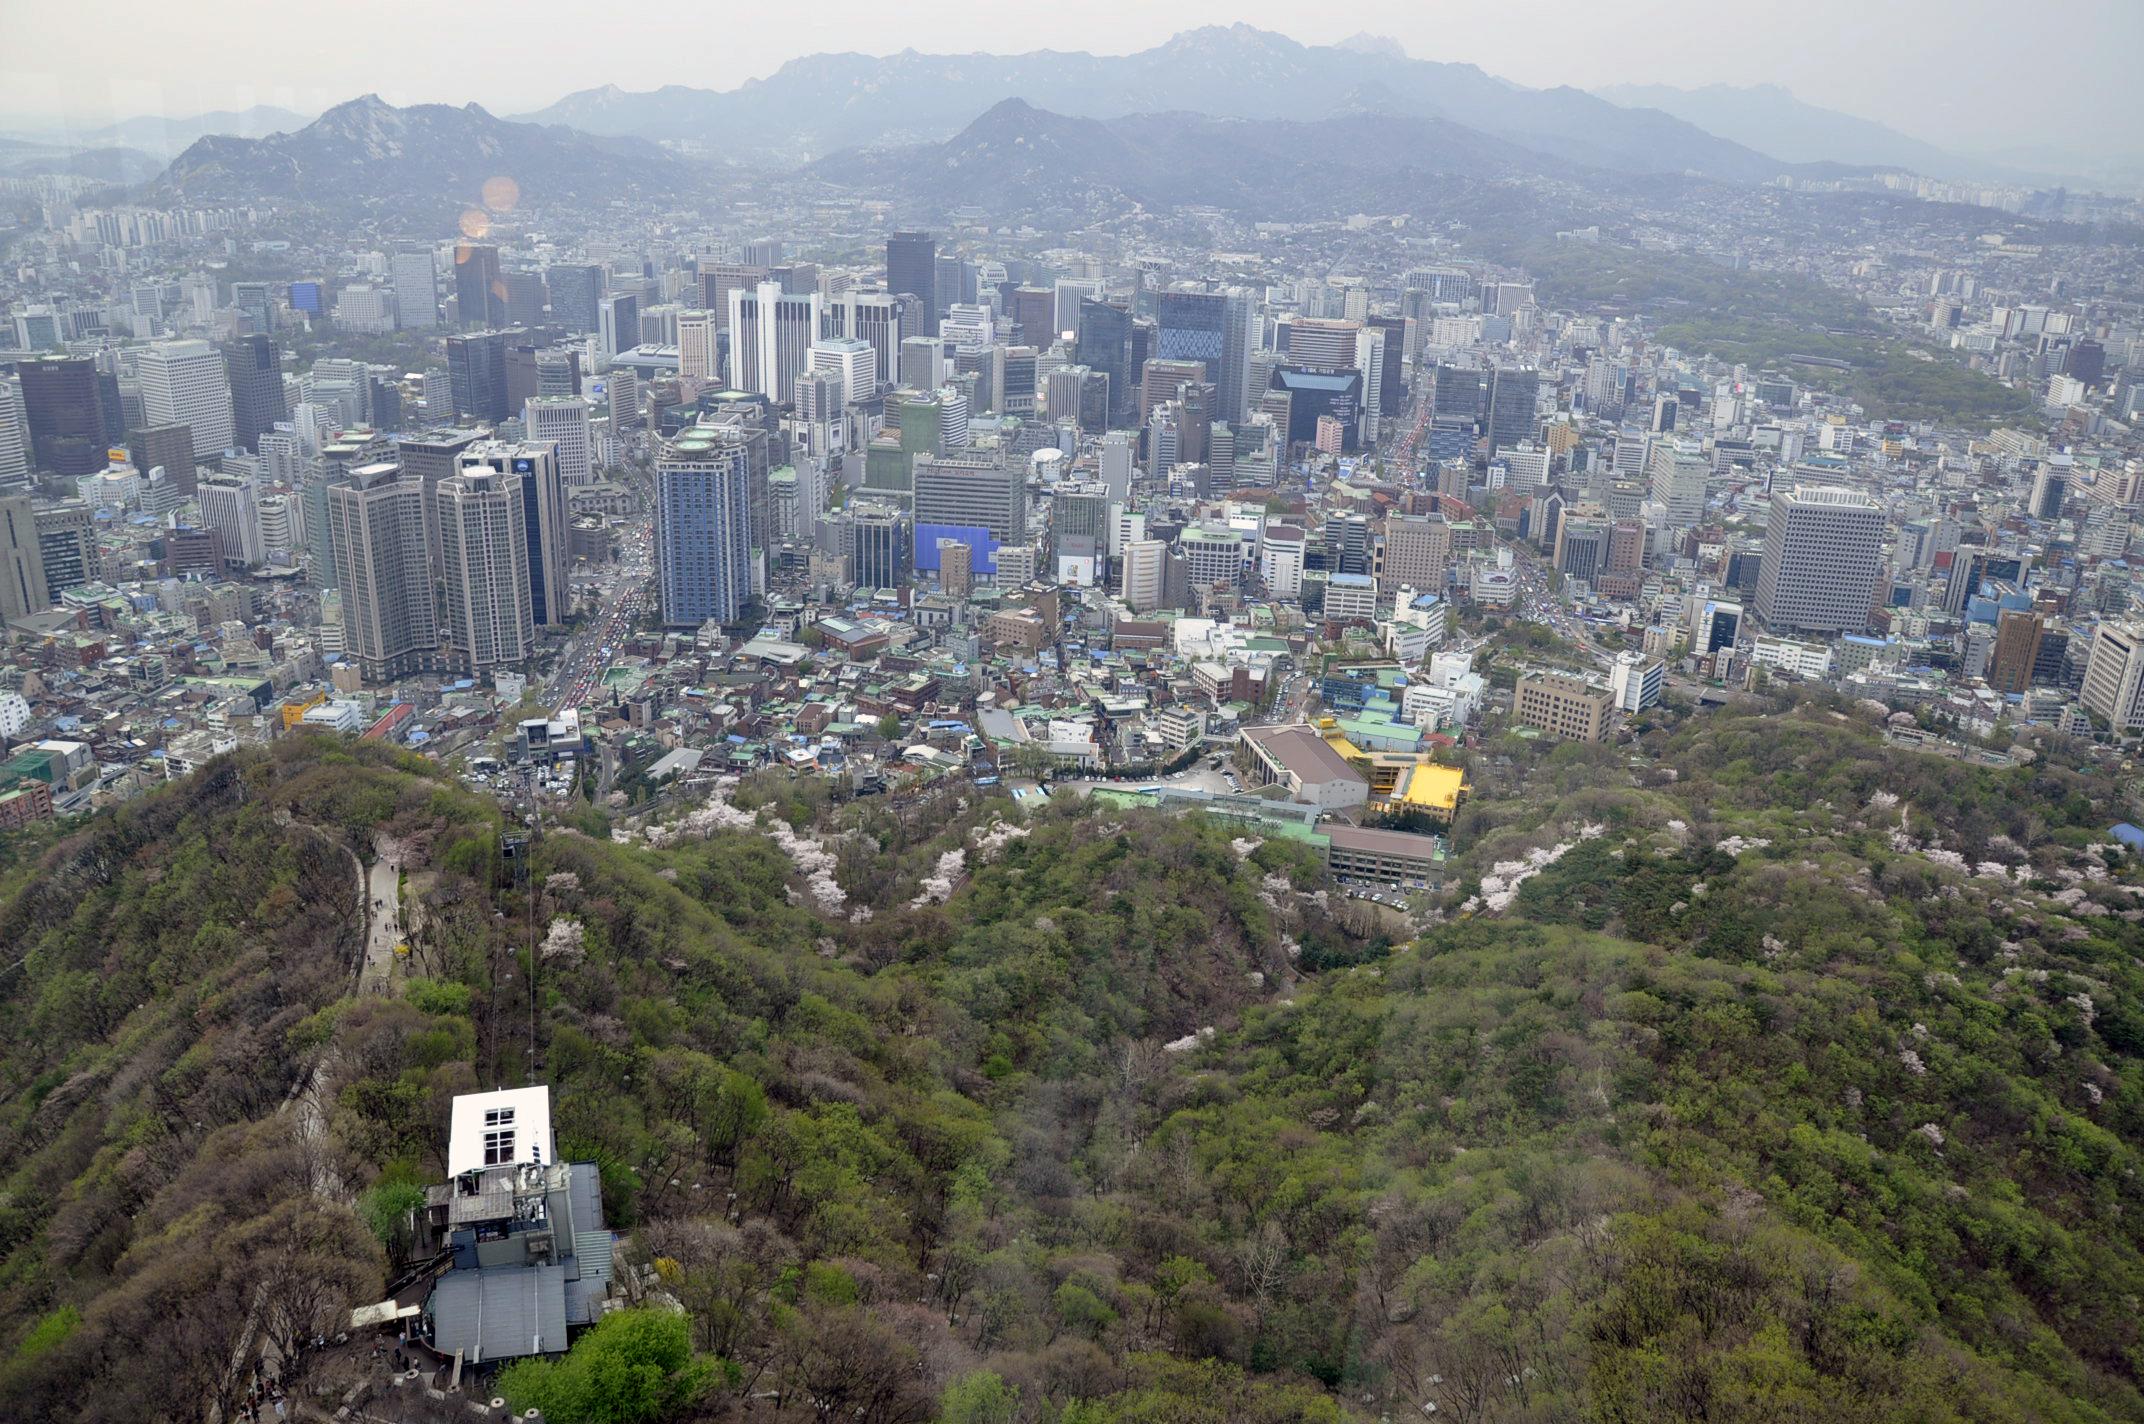 Namsan Park  Seoul 남산공원 서울  Official Korea Tourism